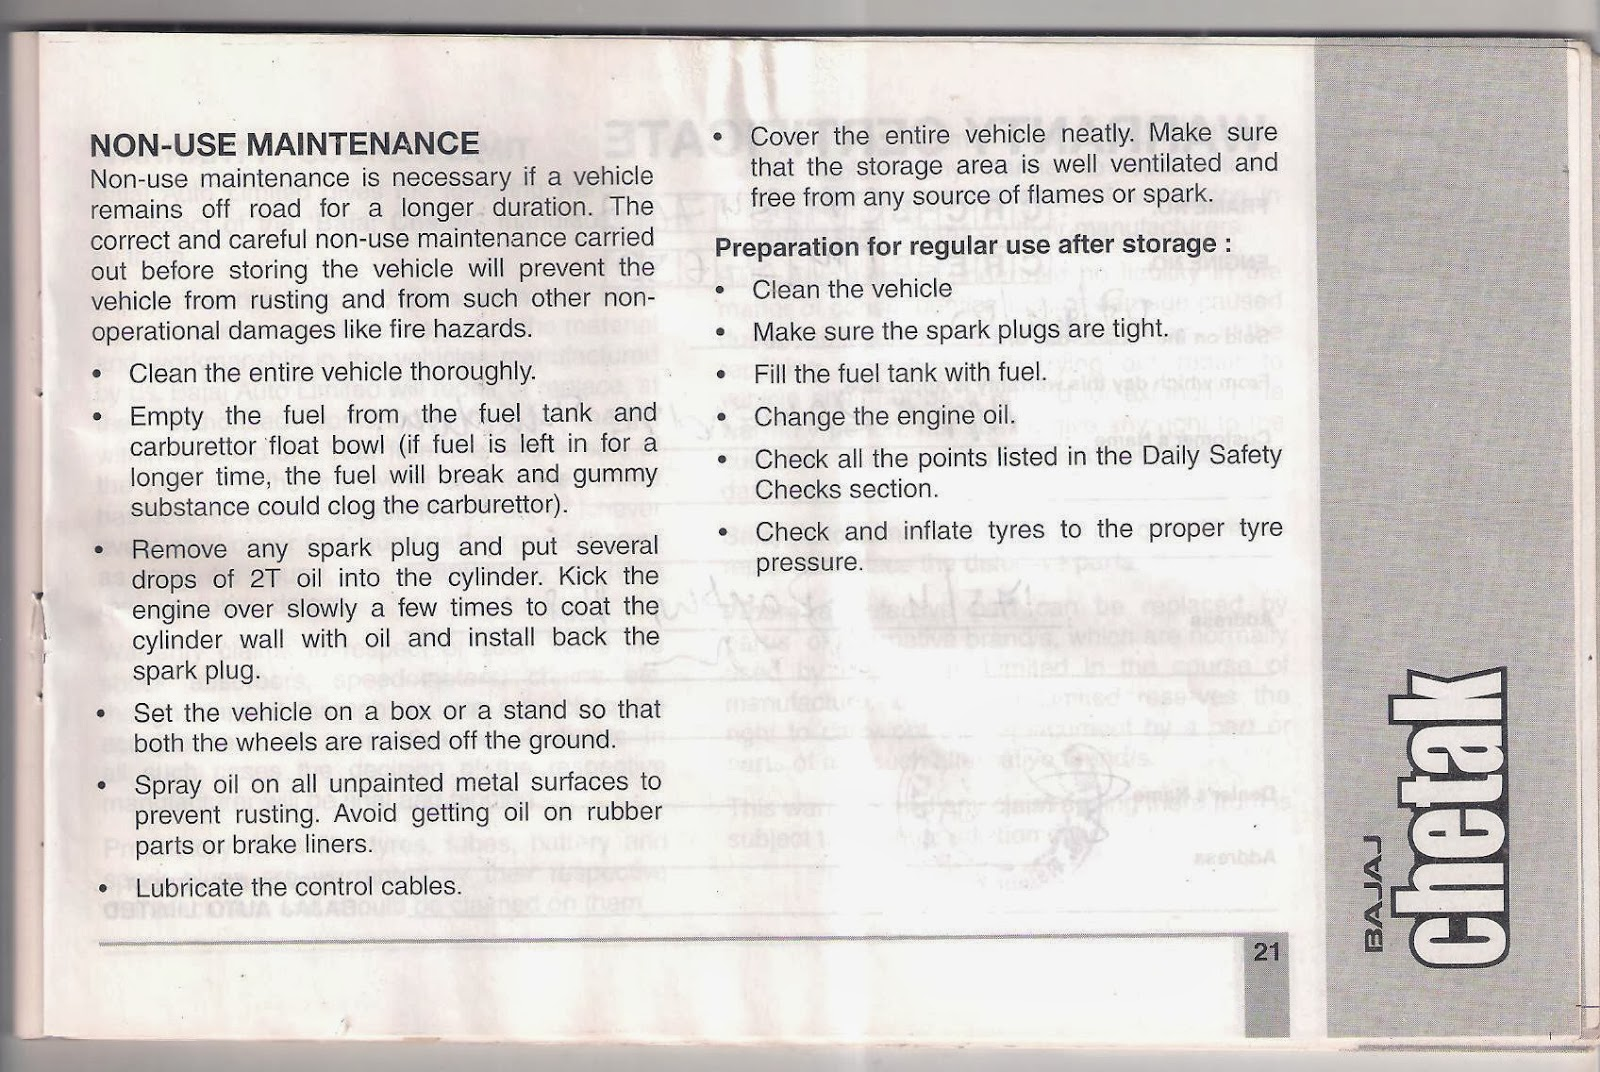 bajaj chetak service manual pdf dirty weekend hd. Black Bedroom Furniture Sets. Home Design Ideas